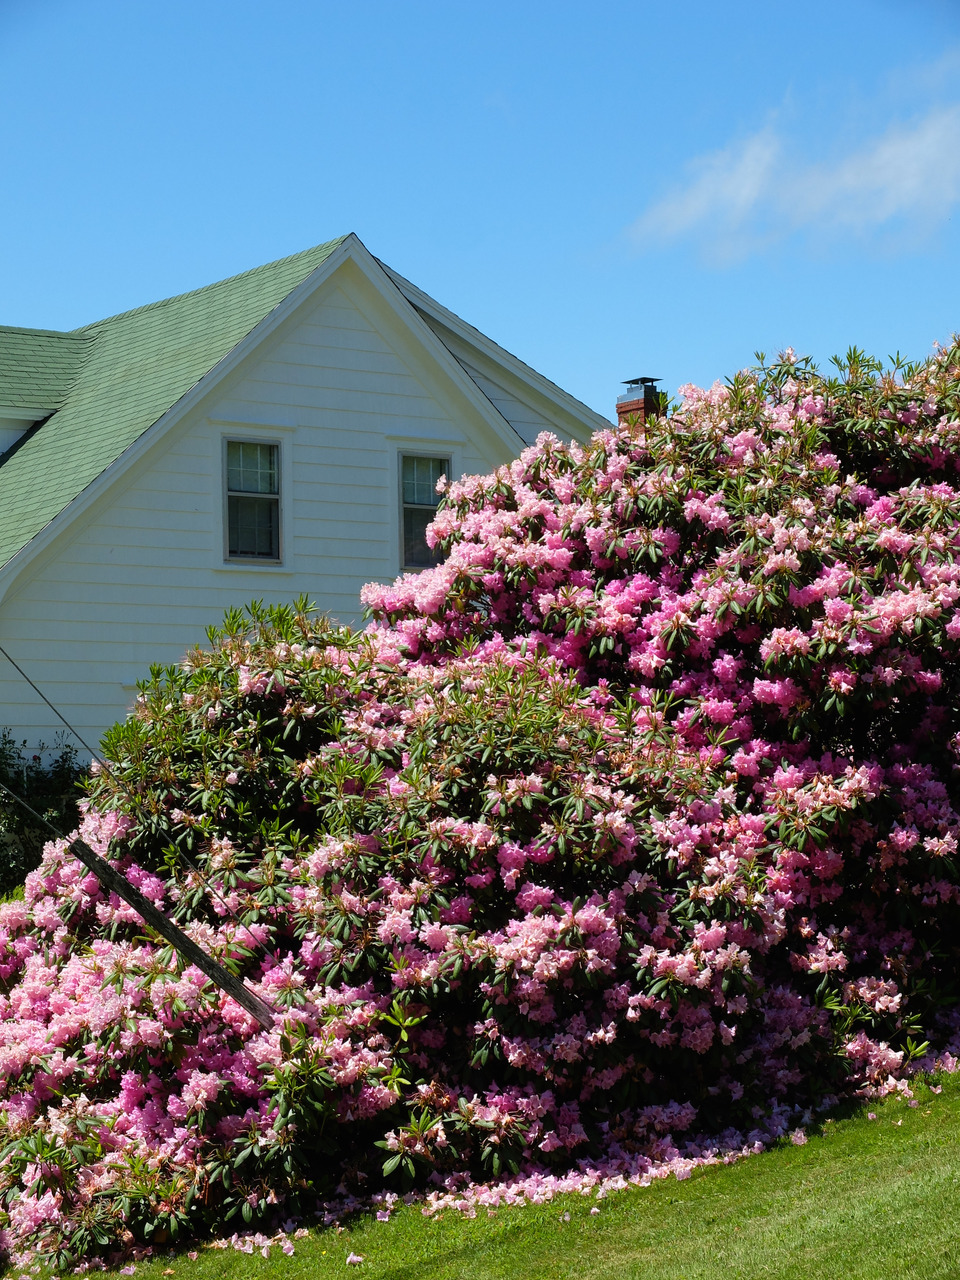 mangia minga // Travels: Lunenburg, Novia Scotia - Knaut Rhuland House